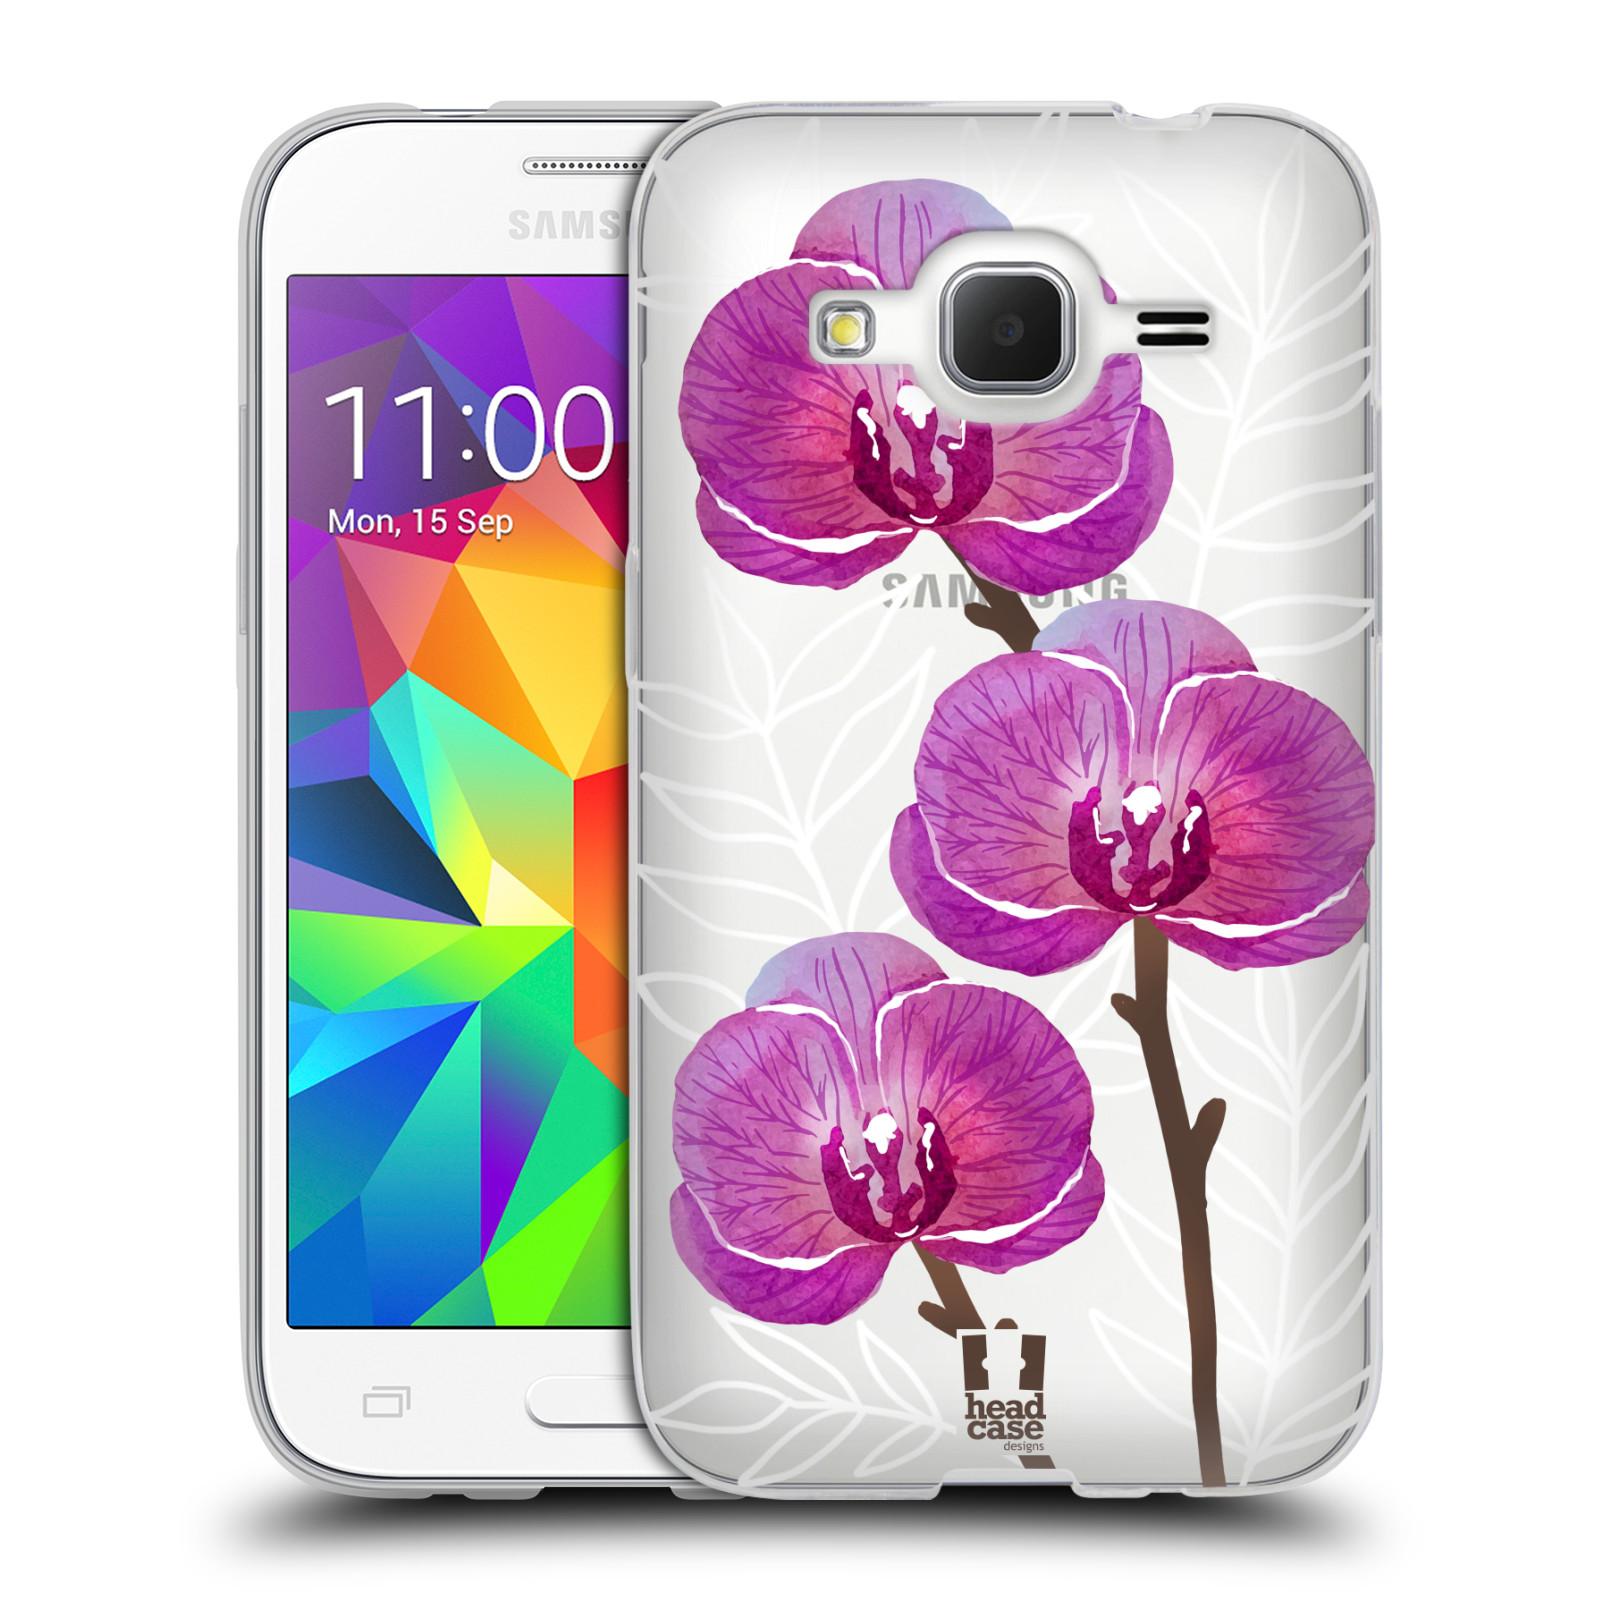 Silikonové pouzdro na mobil Samsung Galaxy Core Prime LTE - Head Case - Hezoučké kvítky - průhledné